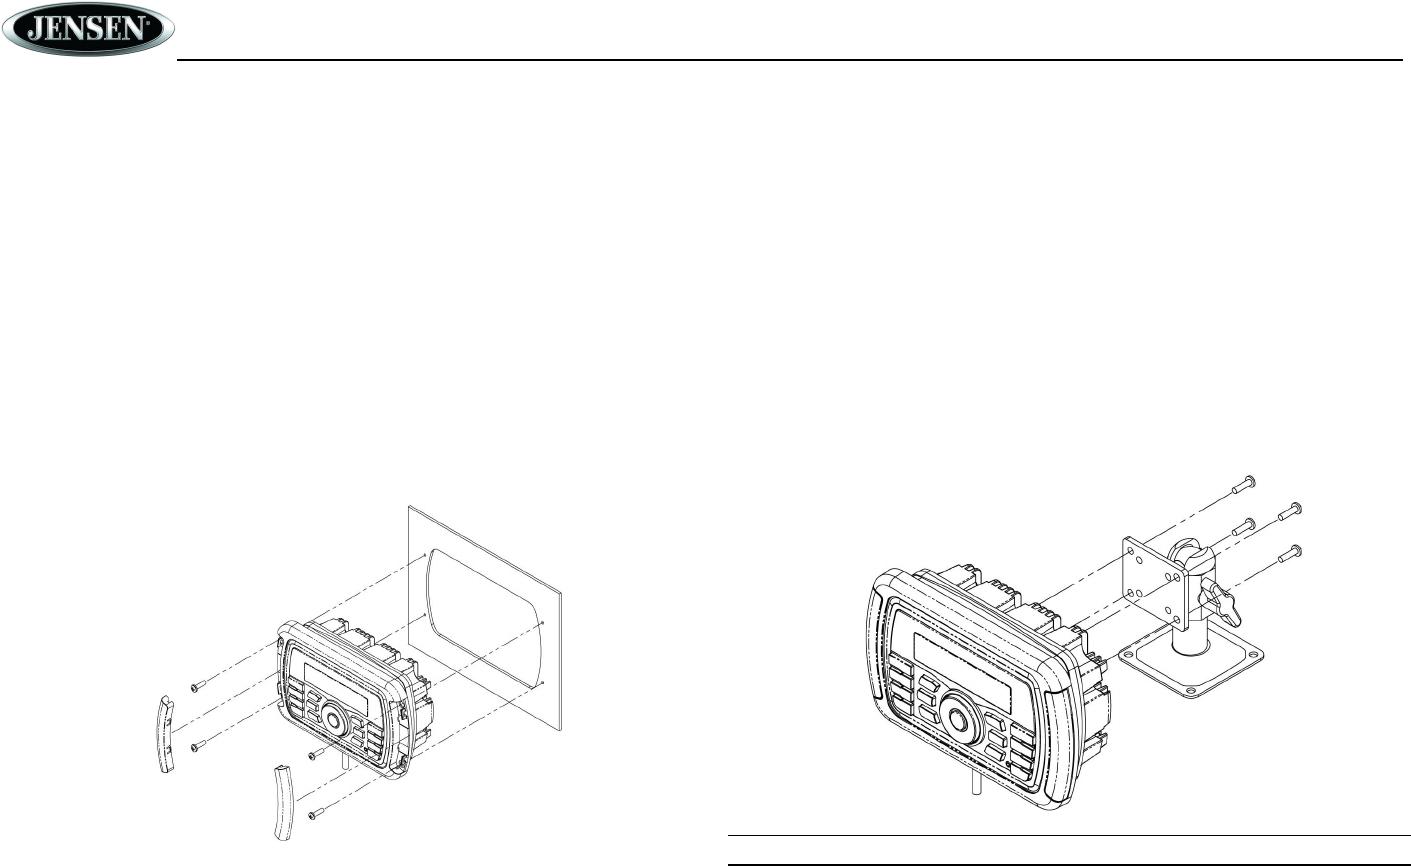 Sounding Audio MS40BT MARINE AUDIO SYSTEM User Manual